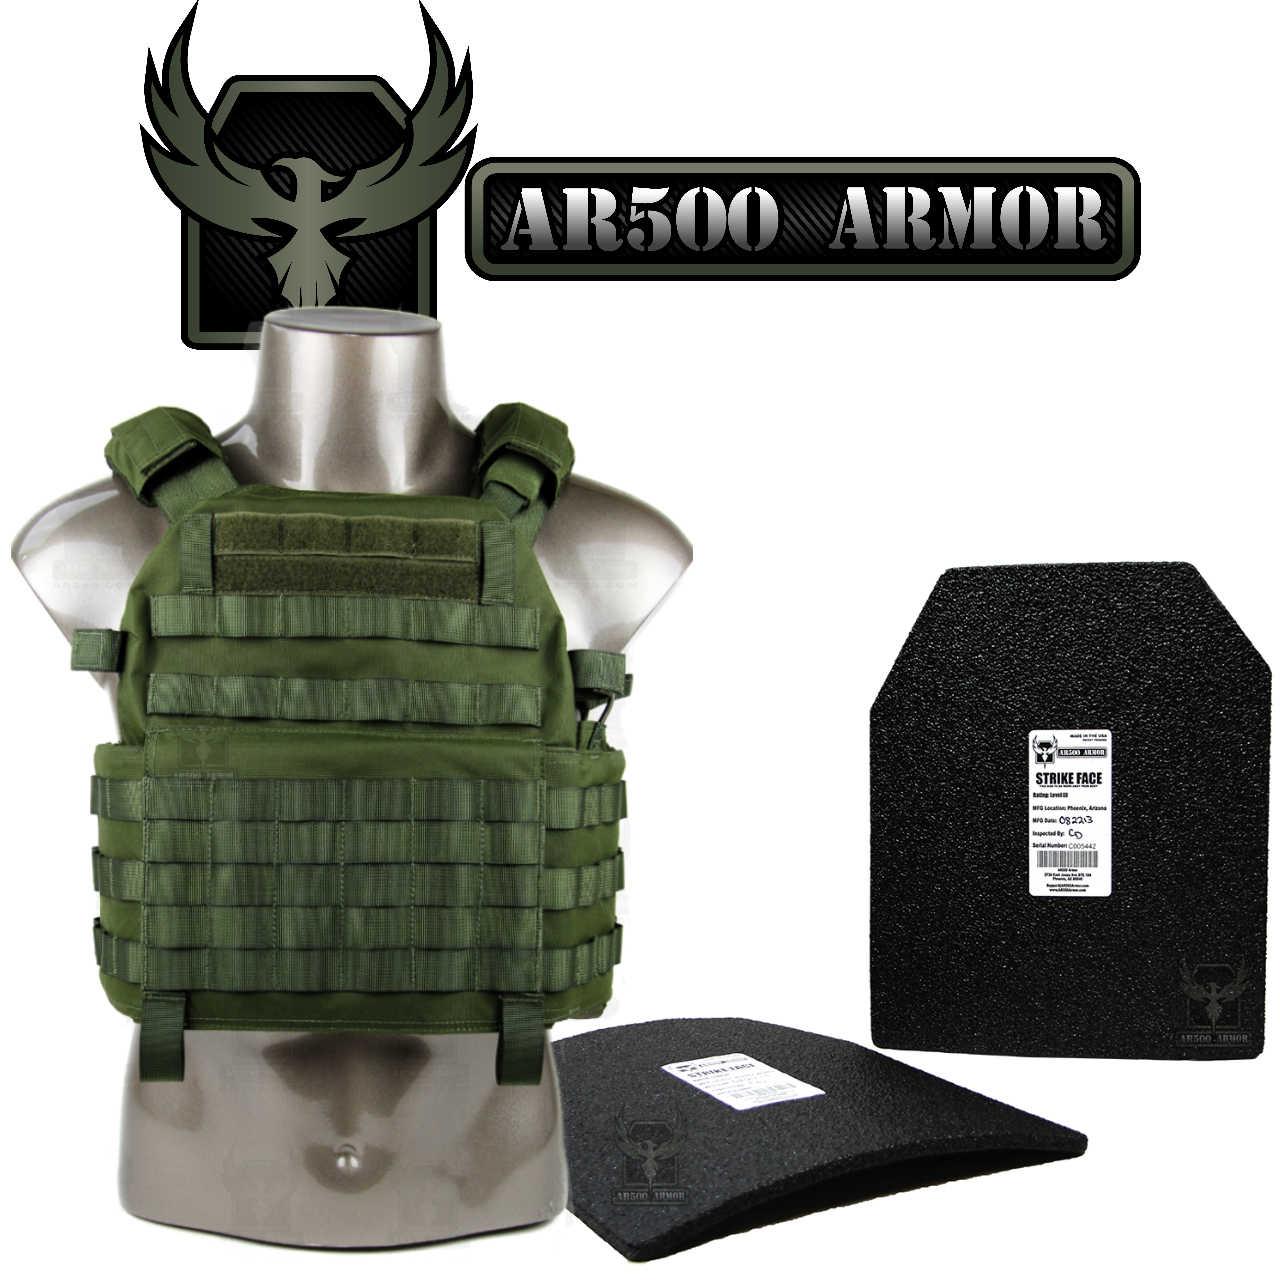 AR500-ARMOR - BrandImage(thumb)